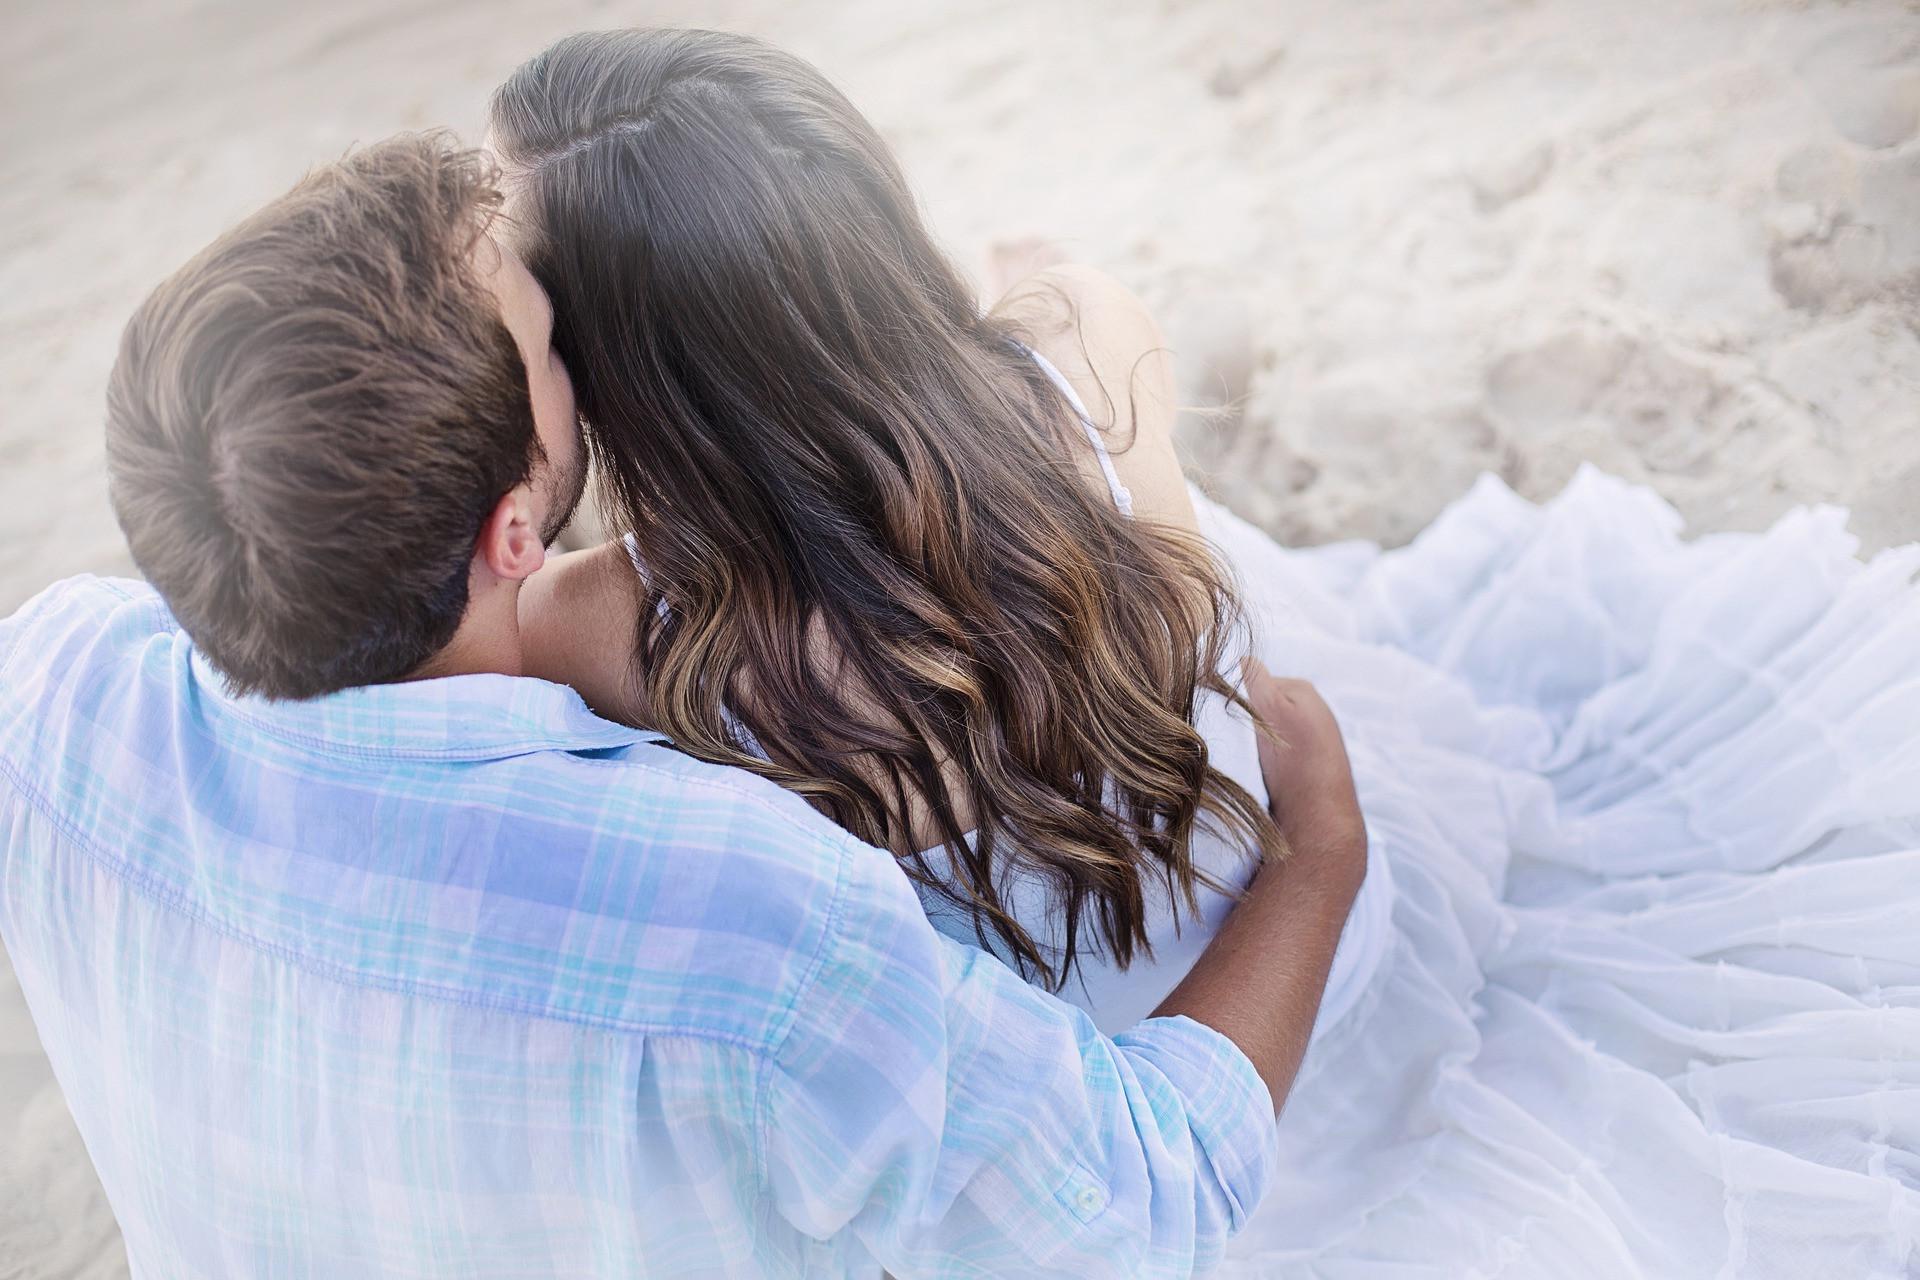 4 Jenis Perselingkuhan yang Perlu Anda Ketahui, Nomor 3 Paling Berbahaya - JPNN.com